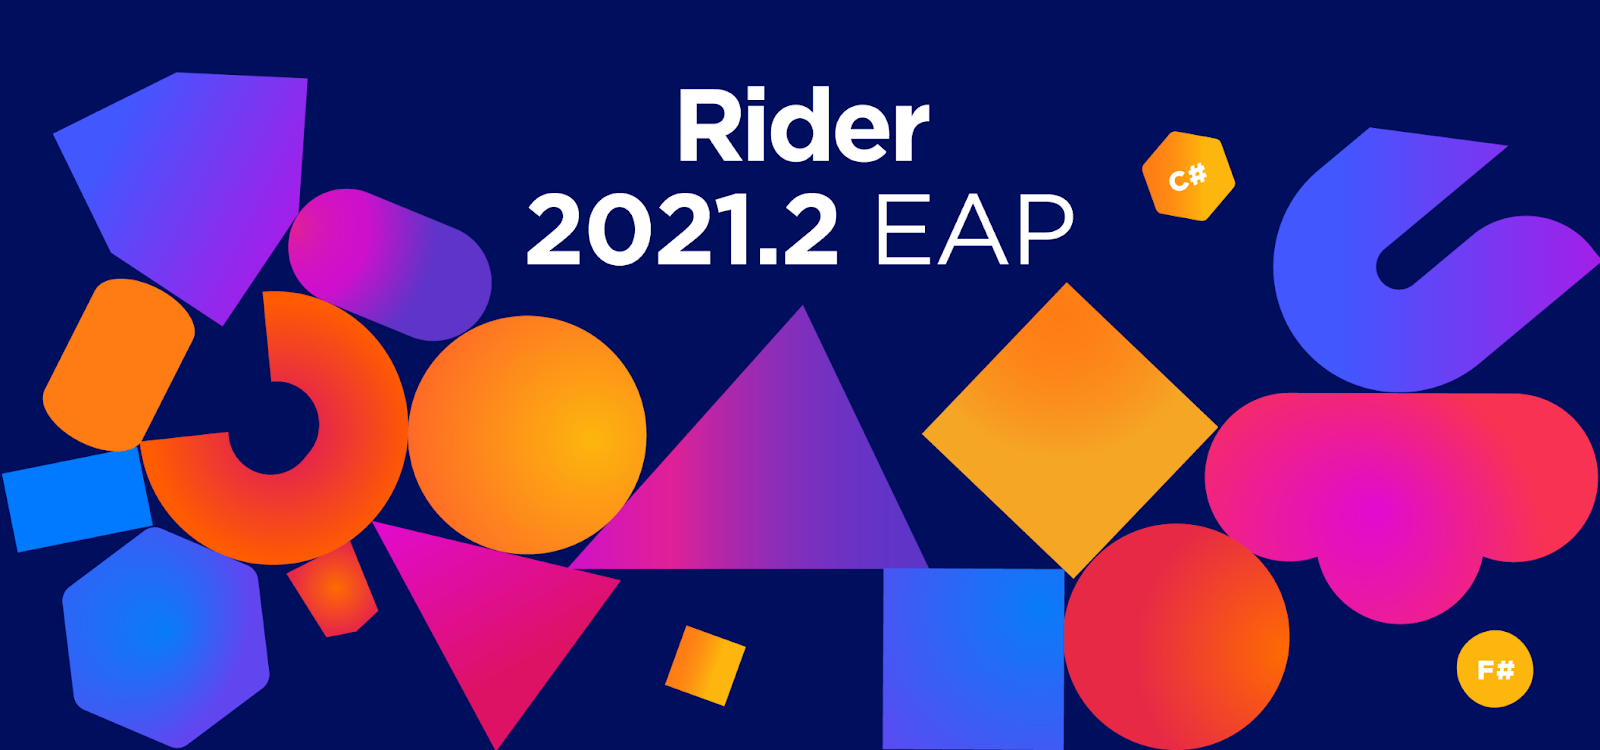 Rider 2021.1 EAP